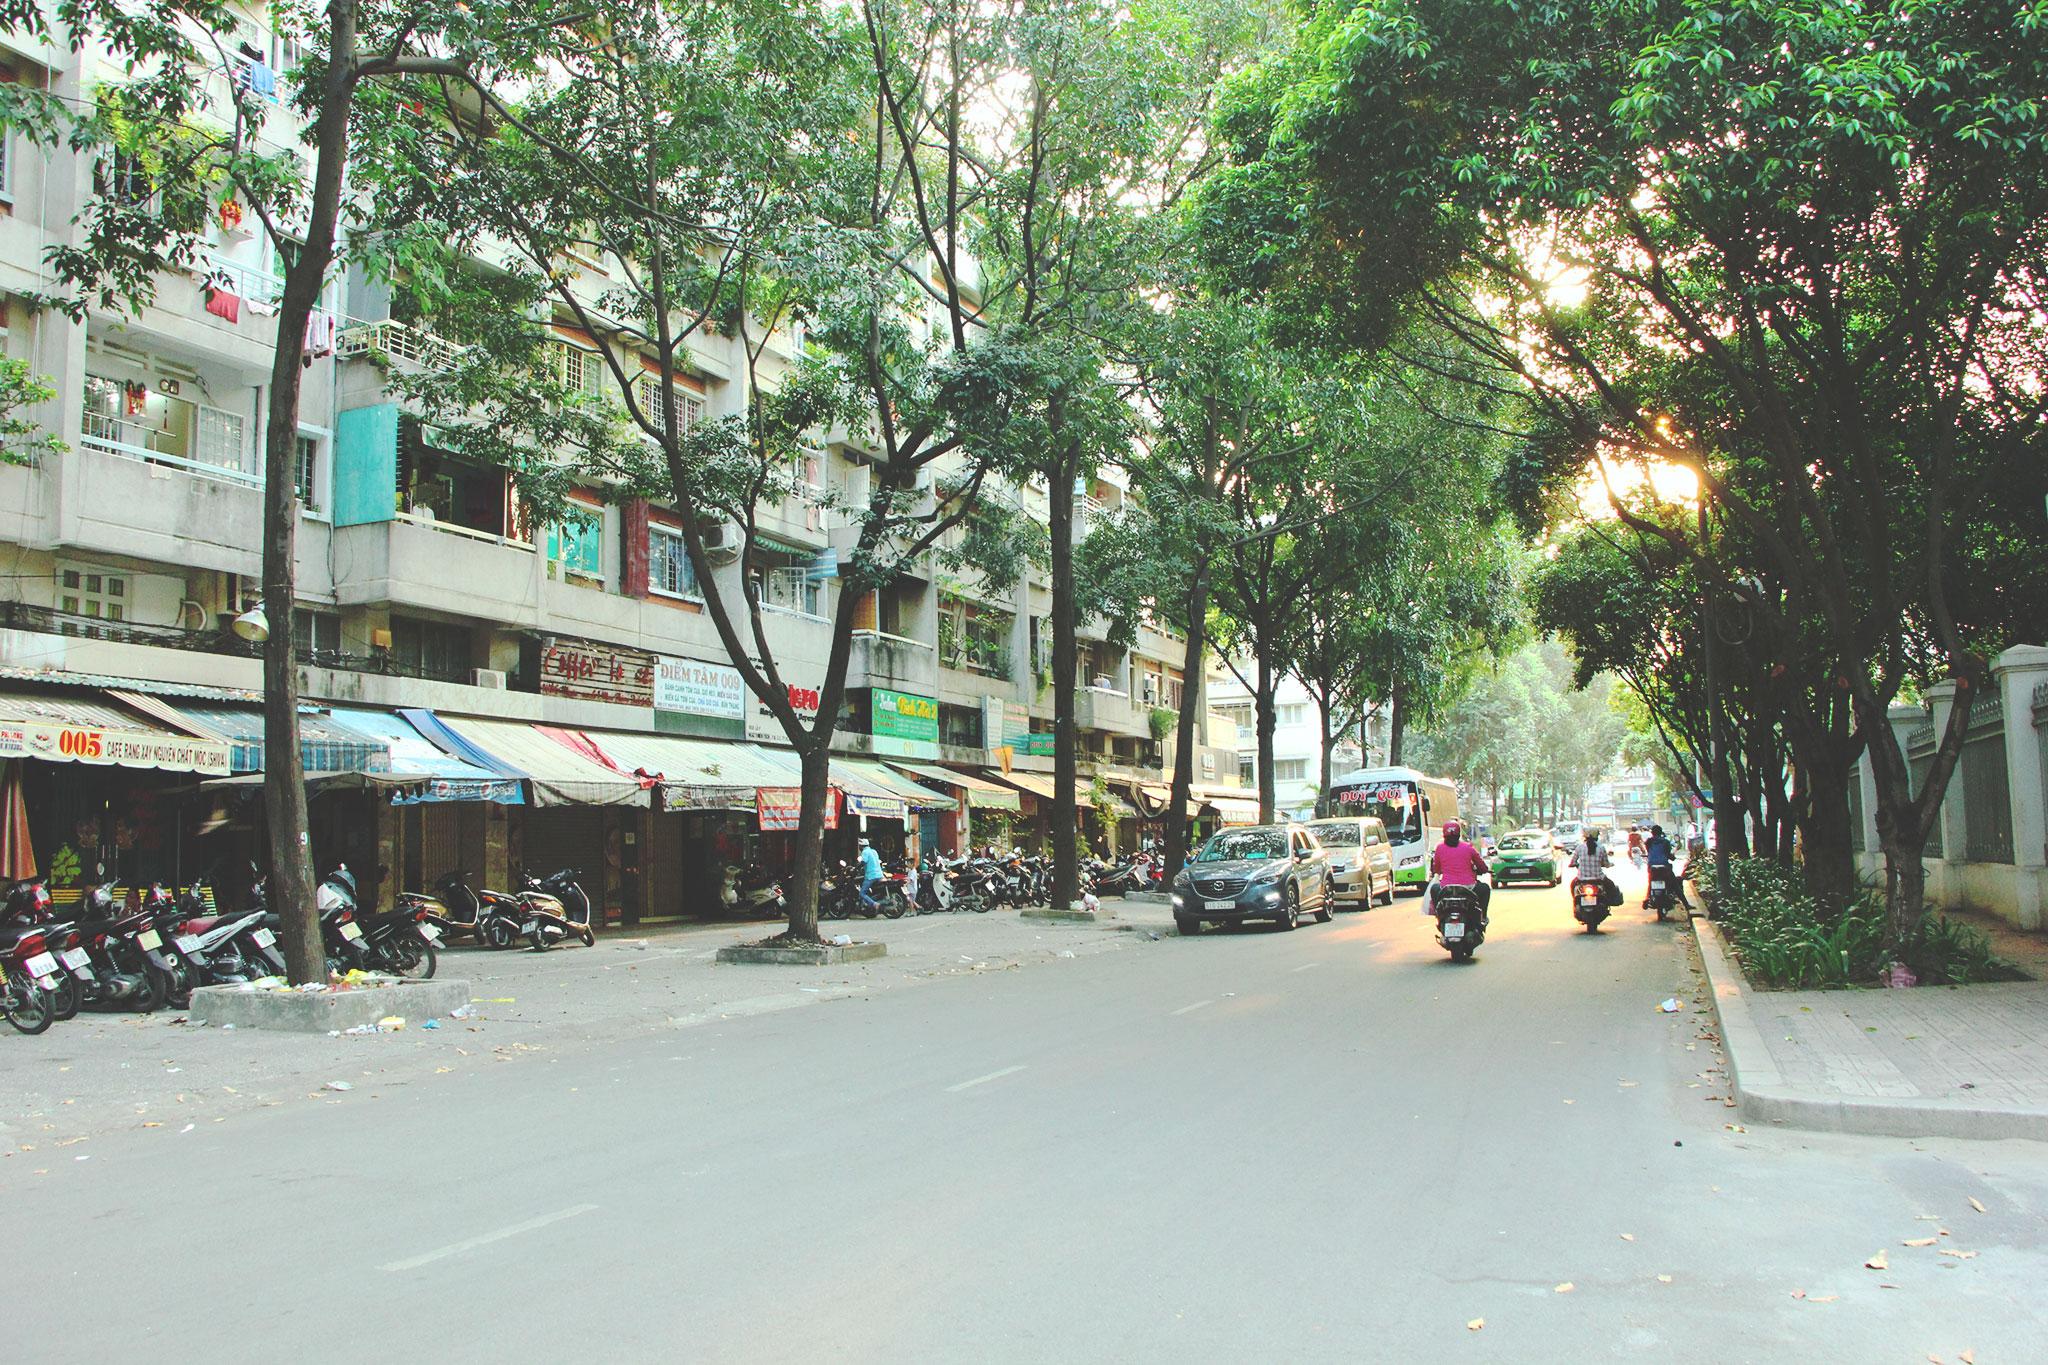 We will go through the beautiful streets around Chinatown